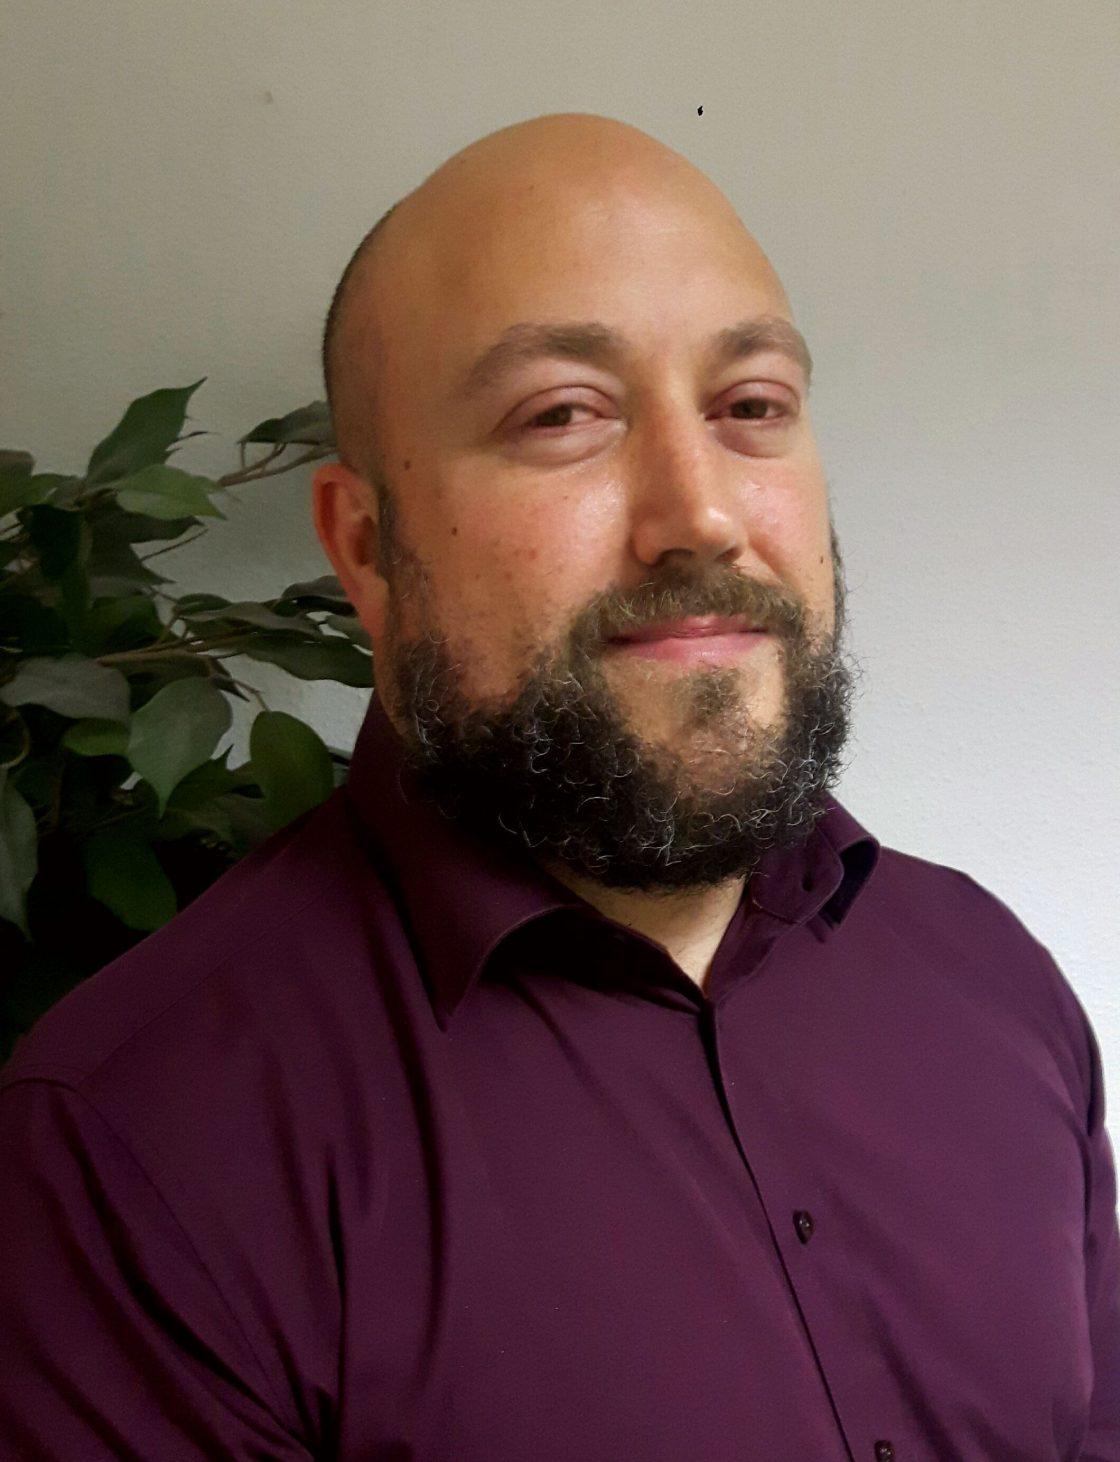 Stuart – Senior Integrated Campaign Manager (Marketing)